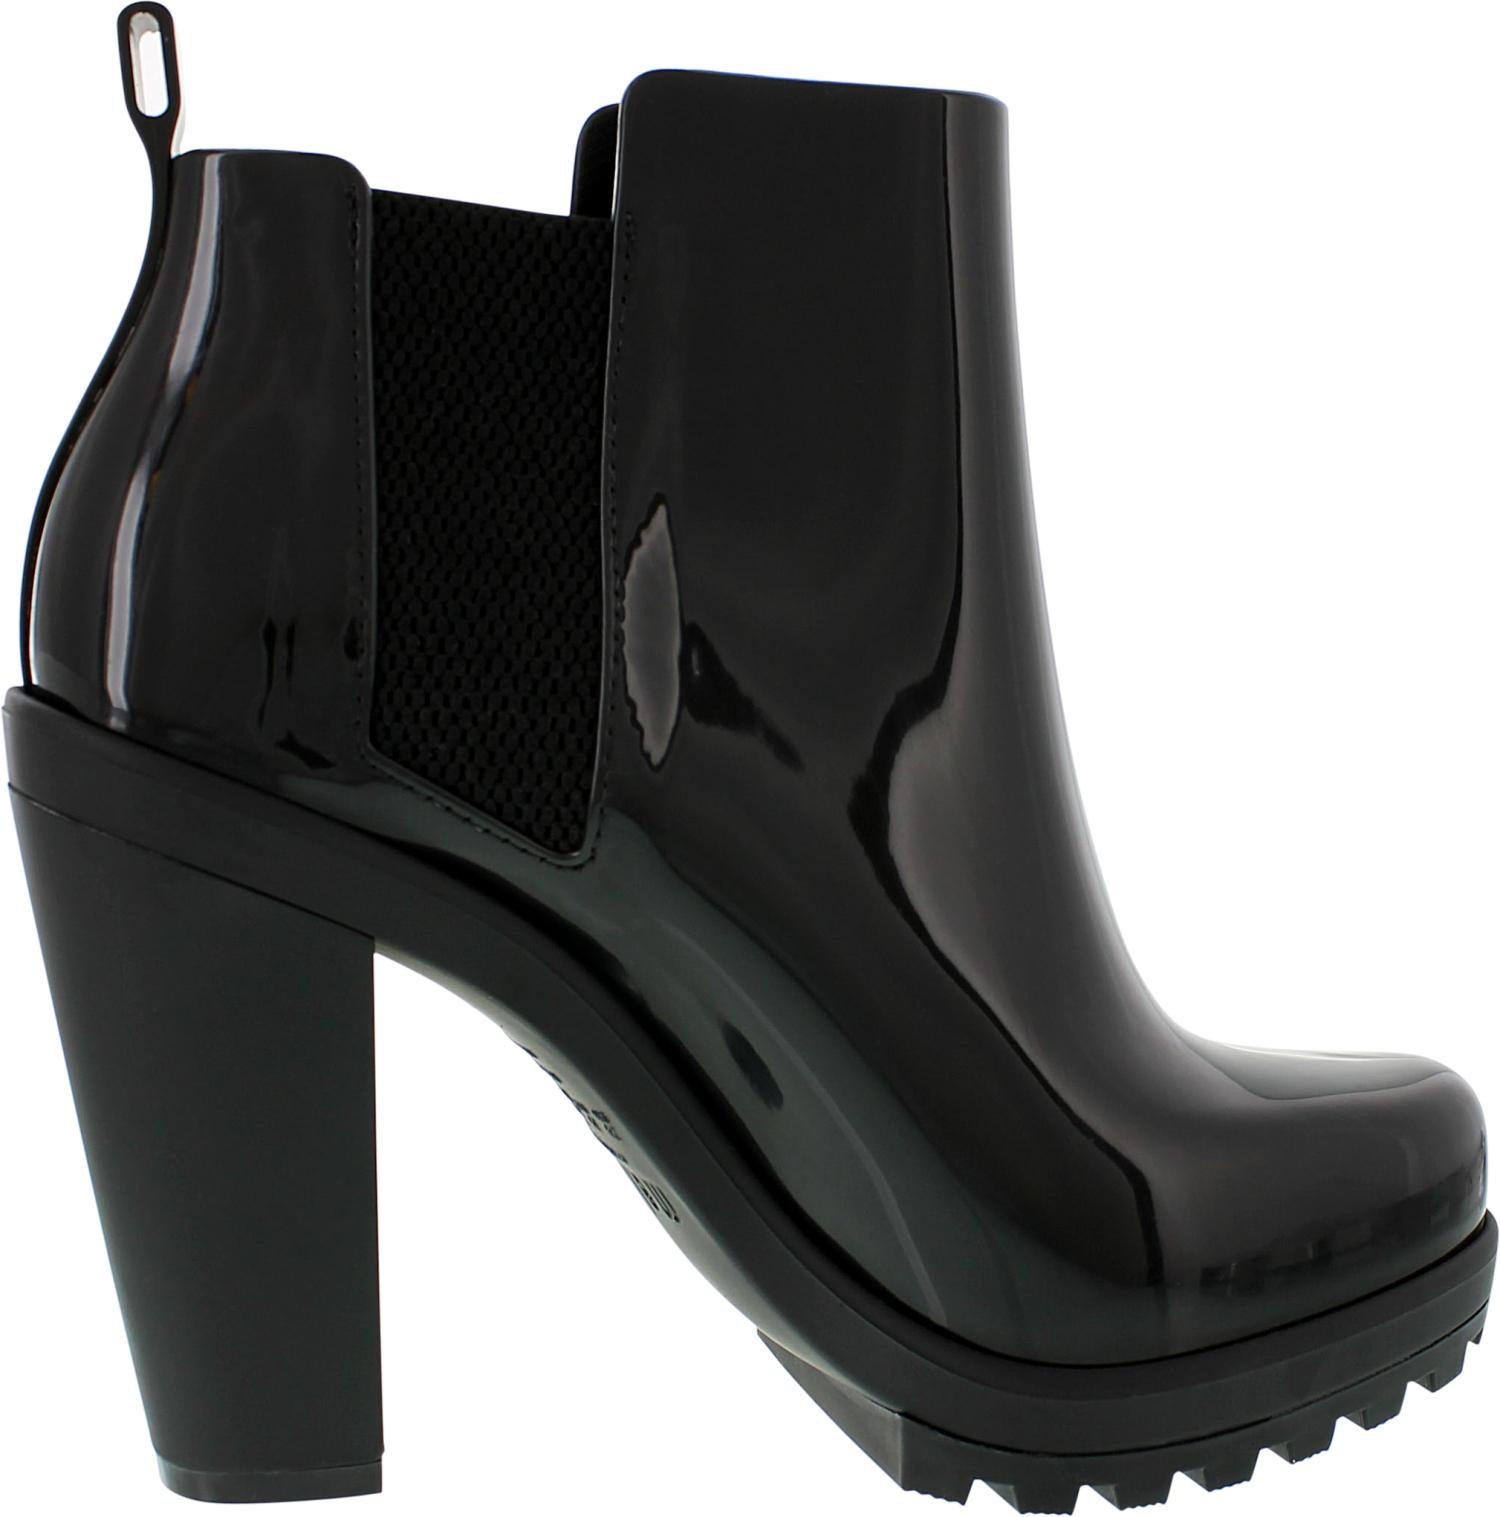 Melissa-Women-039-s-Soldier-Ankle-High-Rubber-Rain-Boot thumbnail 5